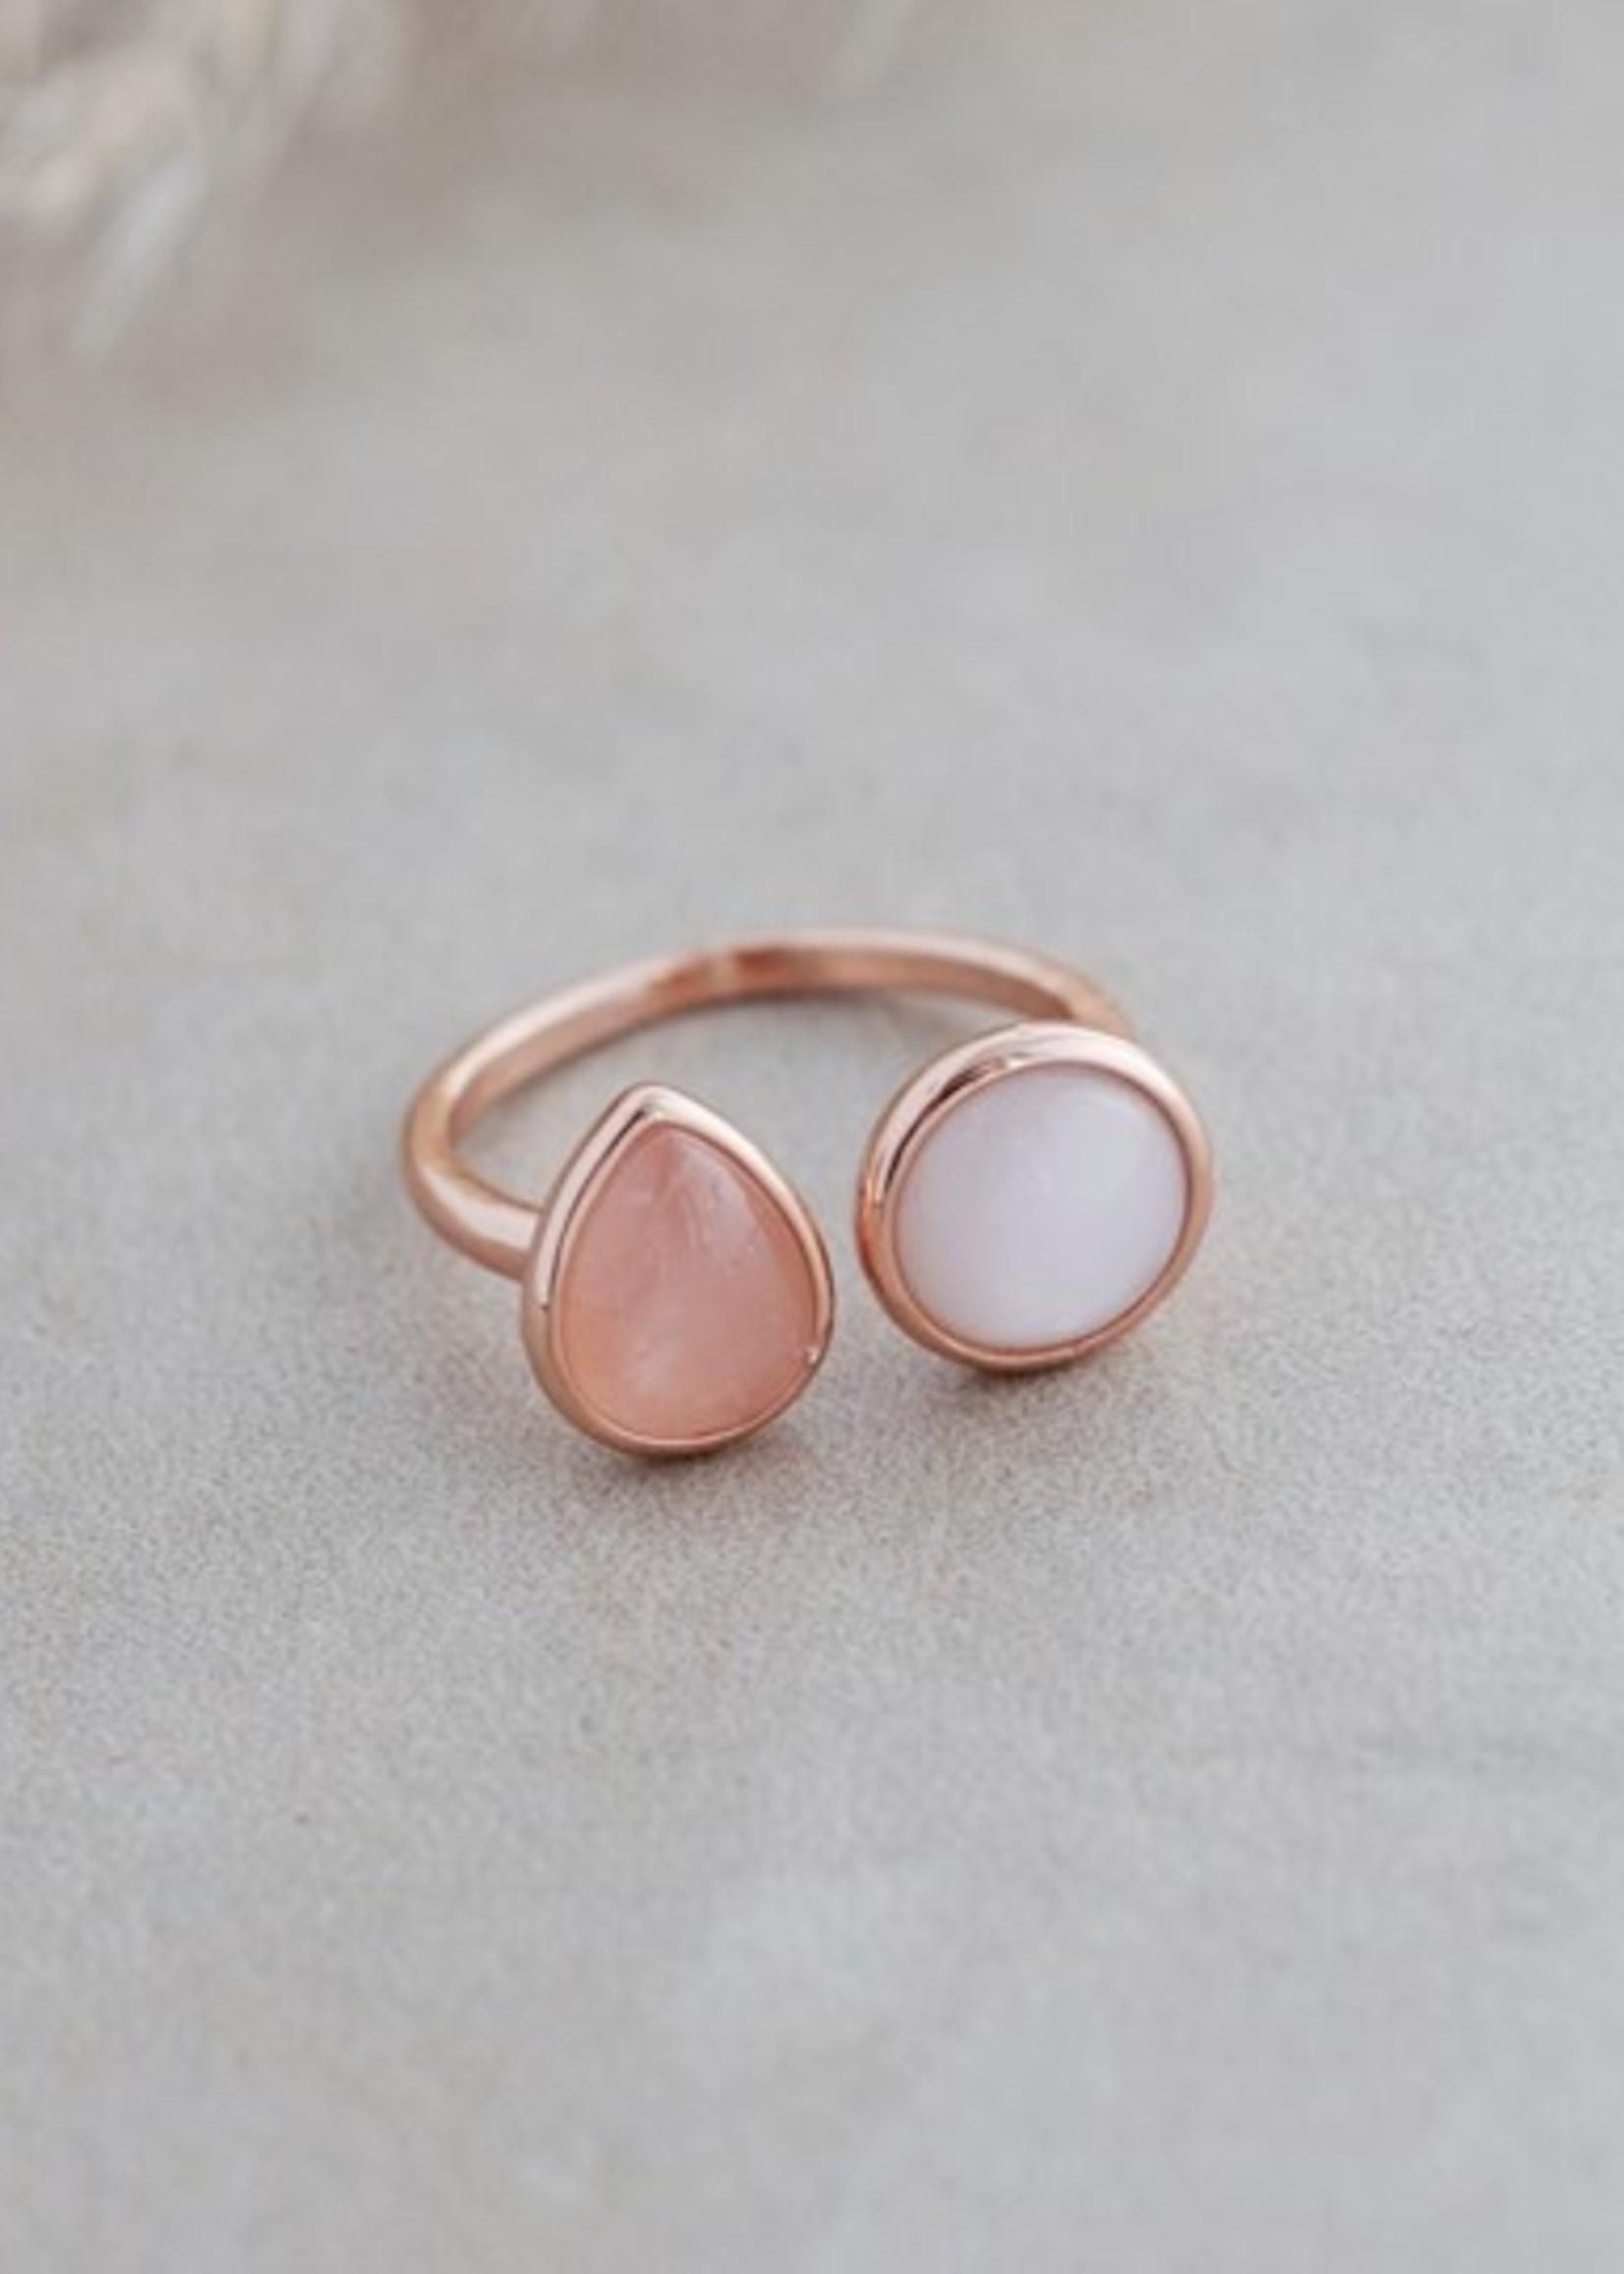 Glee Jewelry Duet Ring Rose quartz/Moonstone